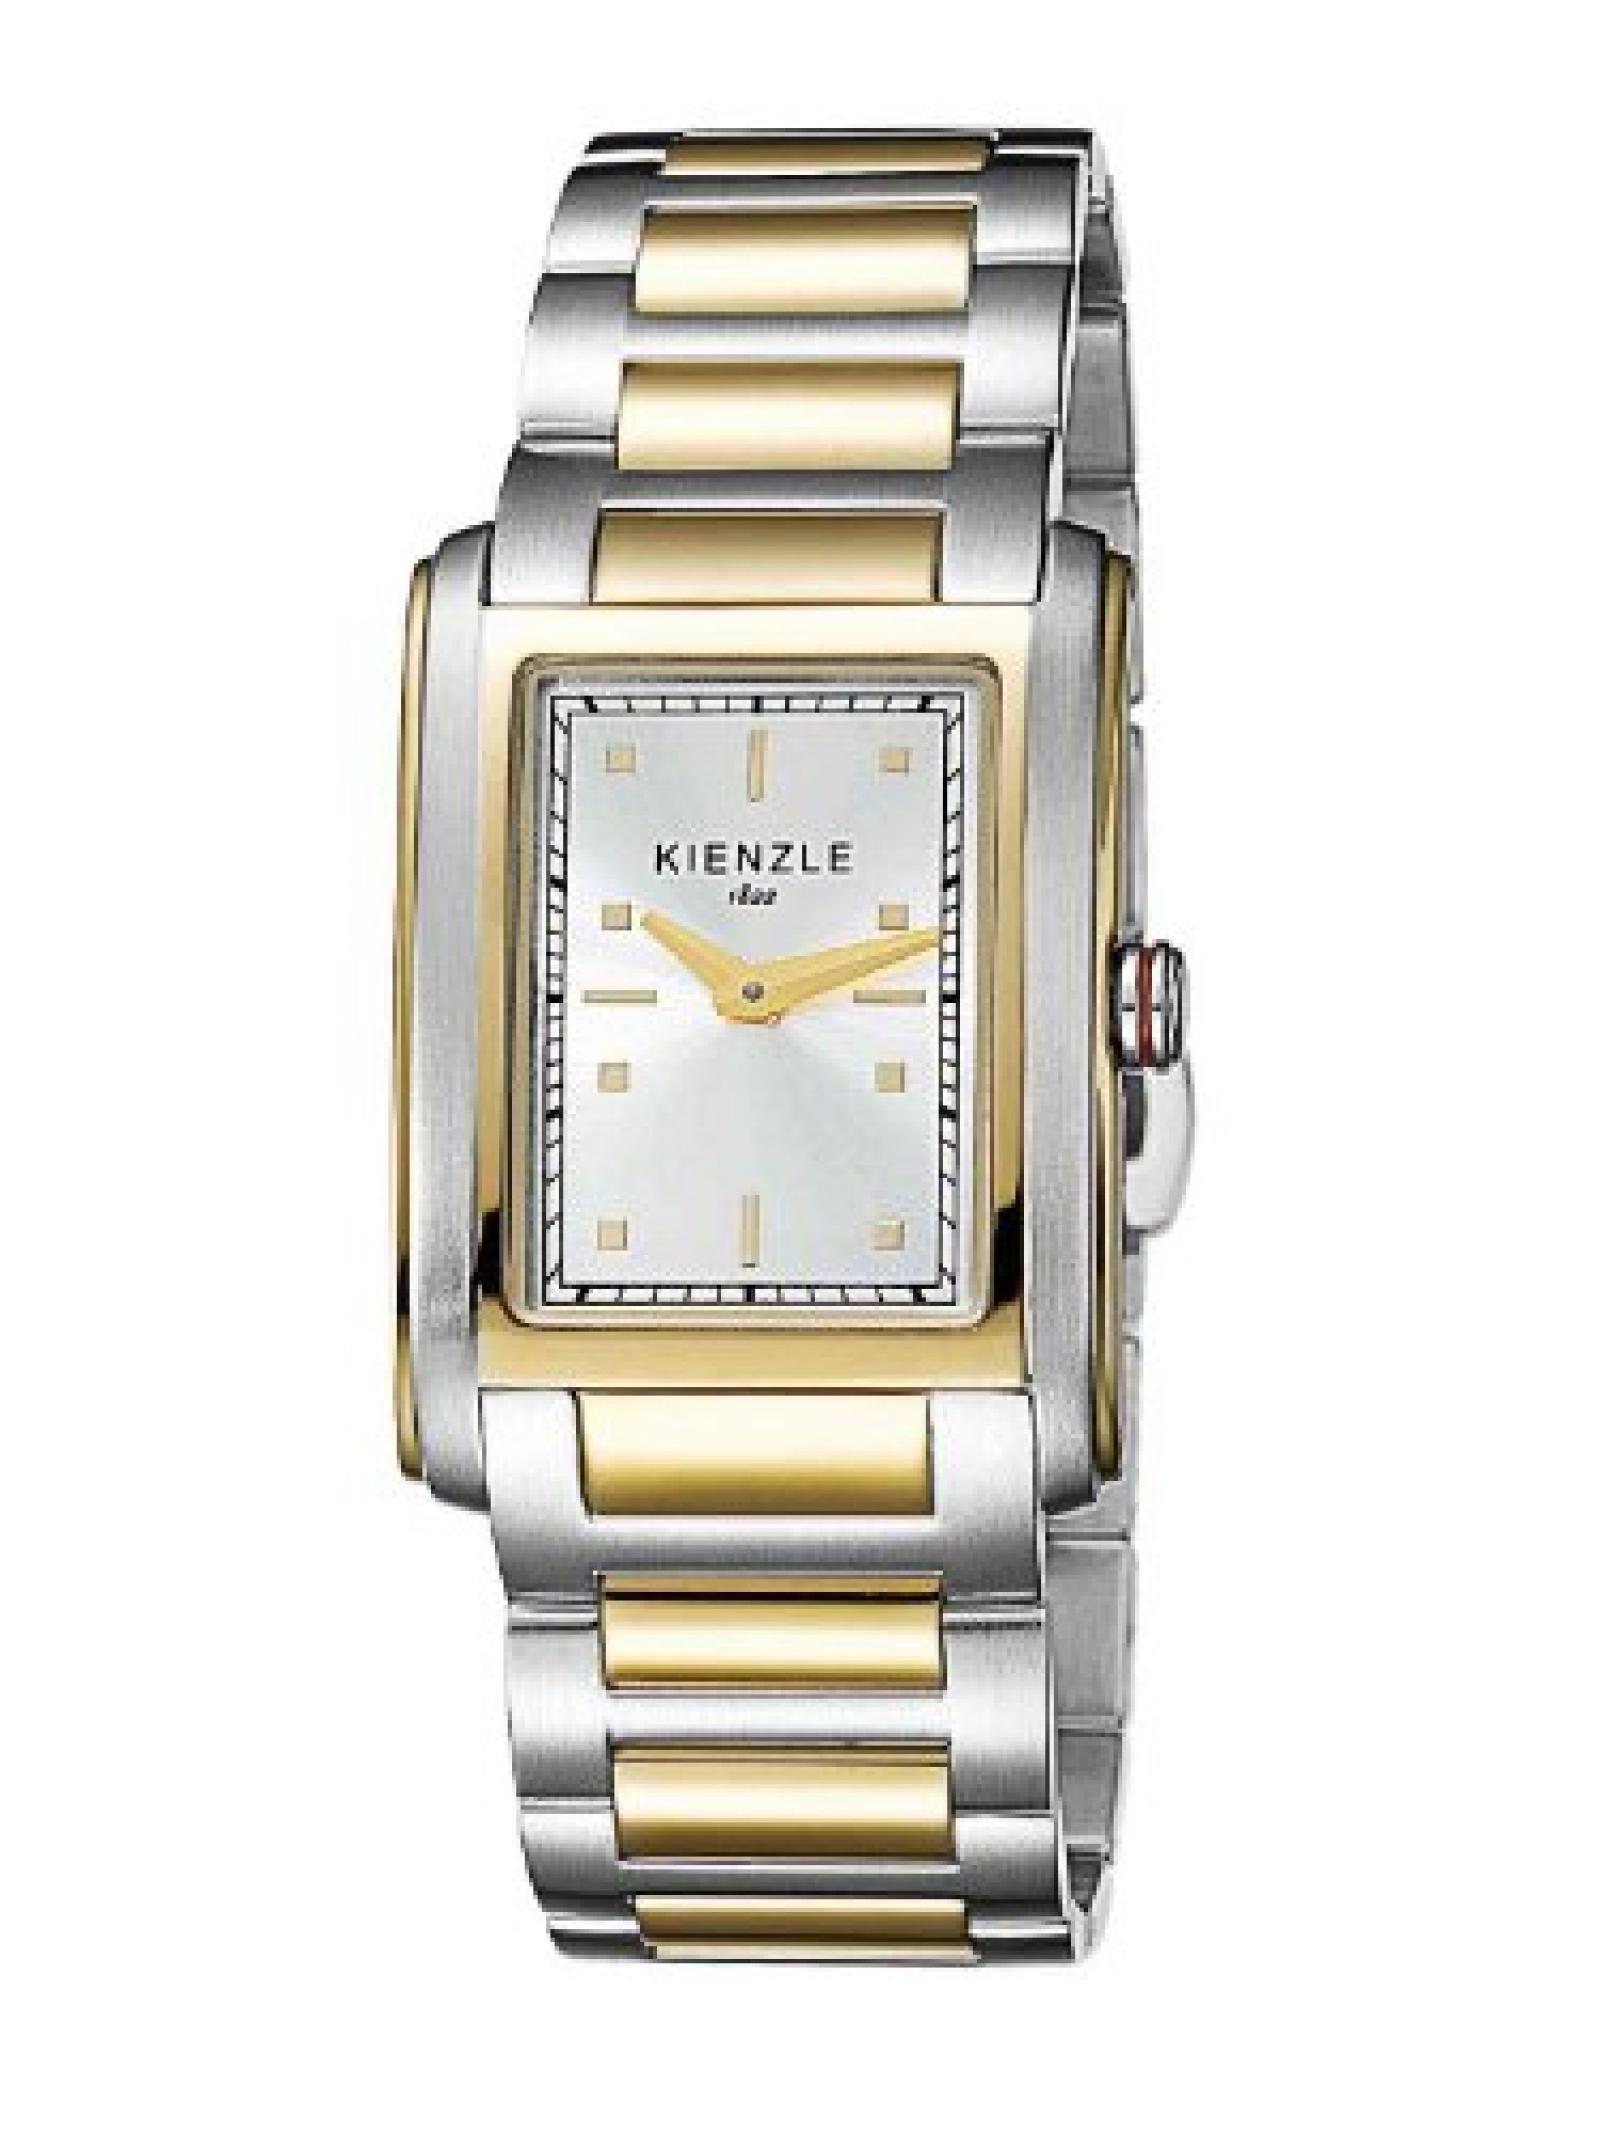 Kienzle Damen-Armbanduhr Analog Edelstahl beschichtet K5082101062